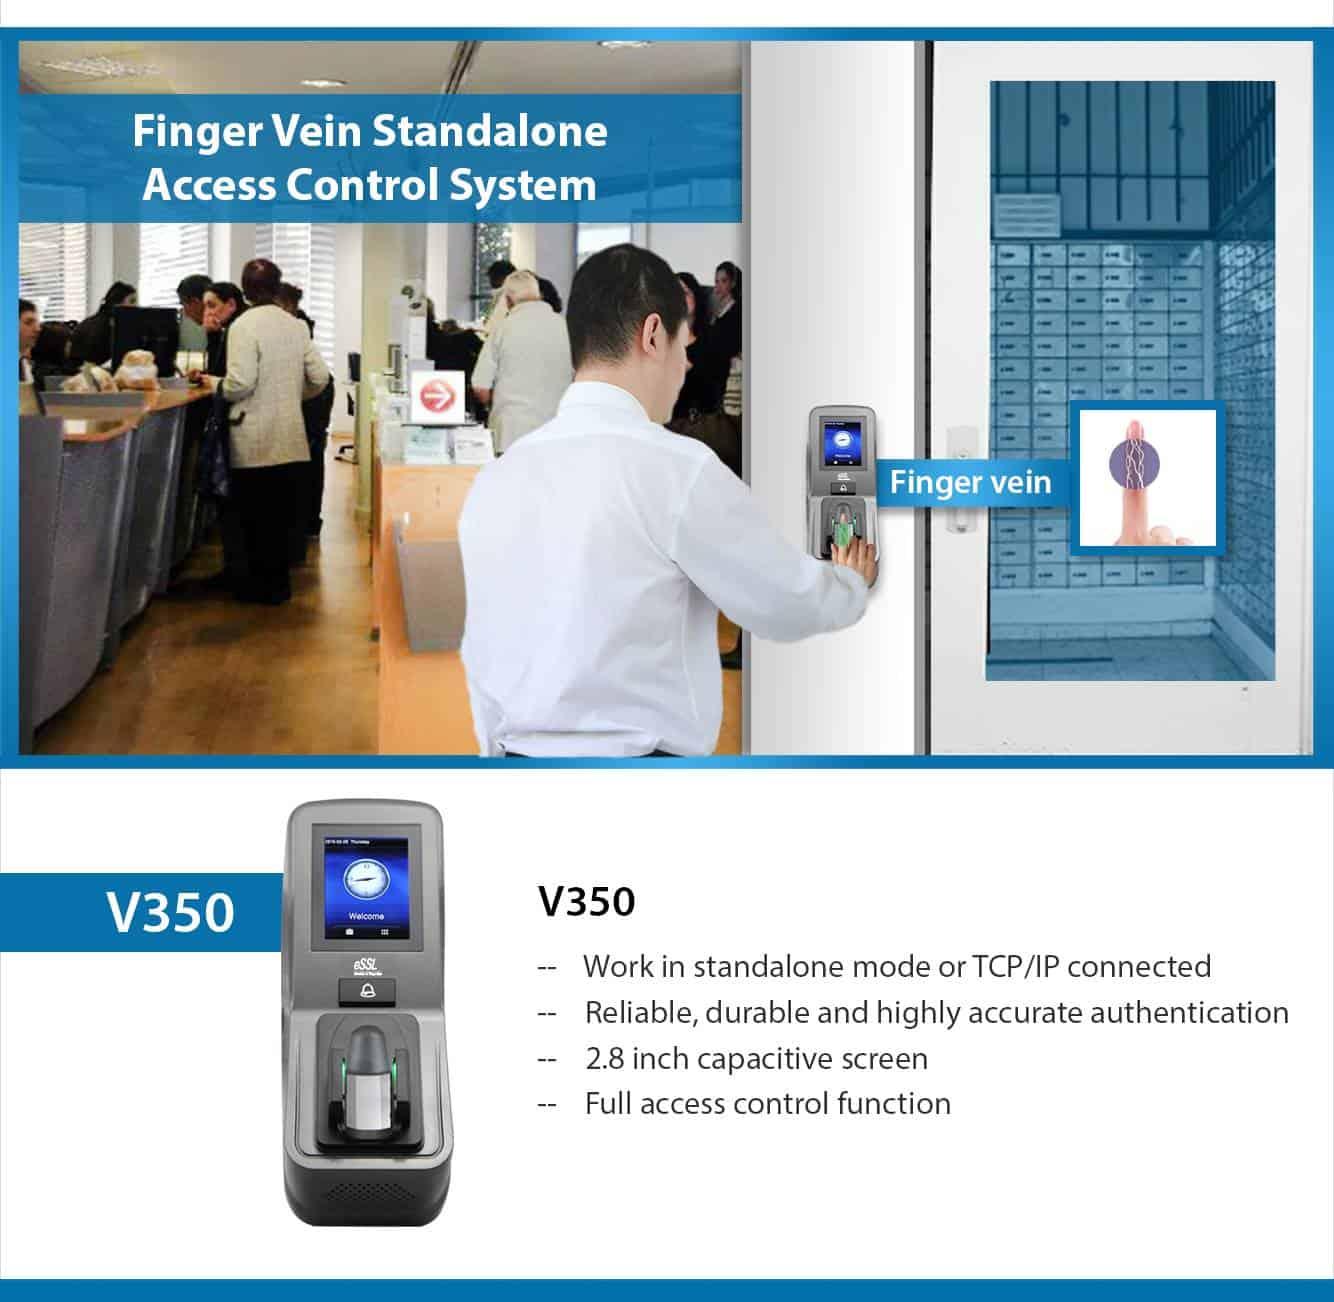 Finger Vein Access control system eSSL FV350